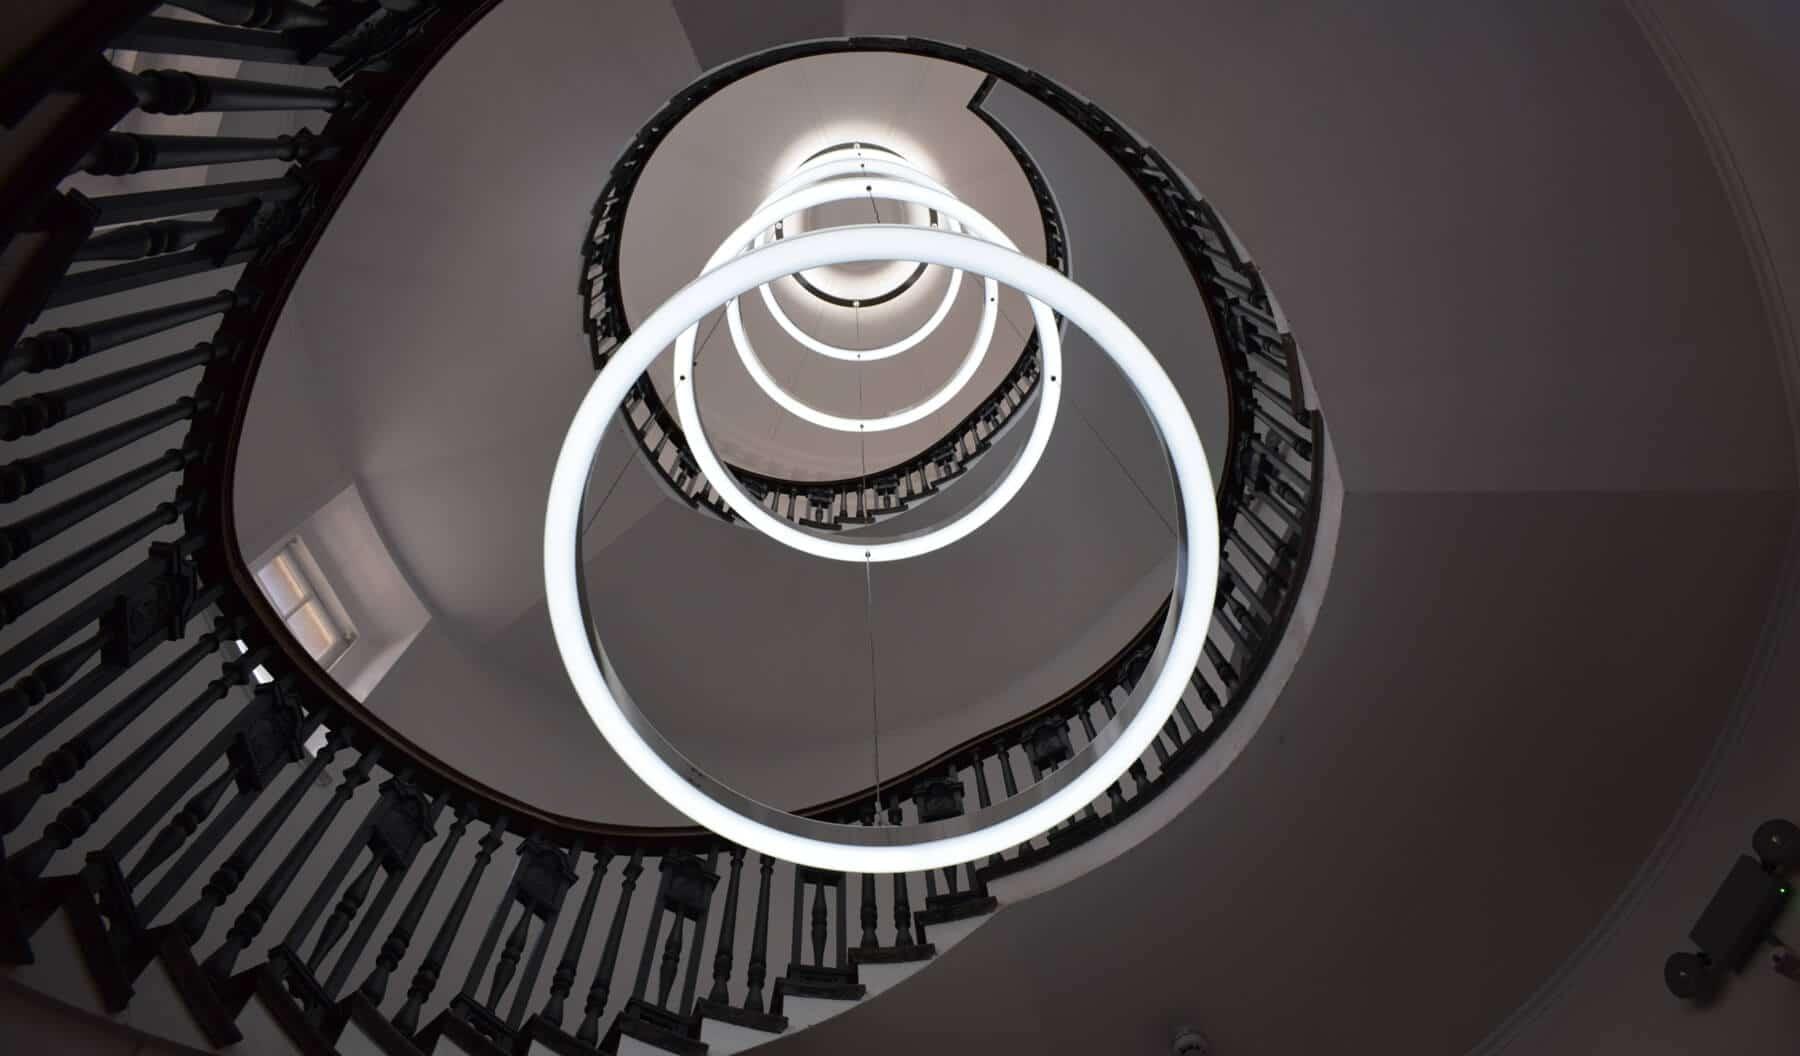 Eclipsis lighting